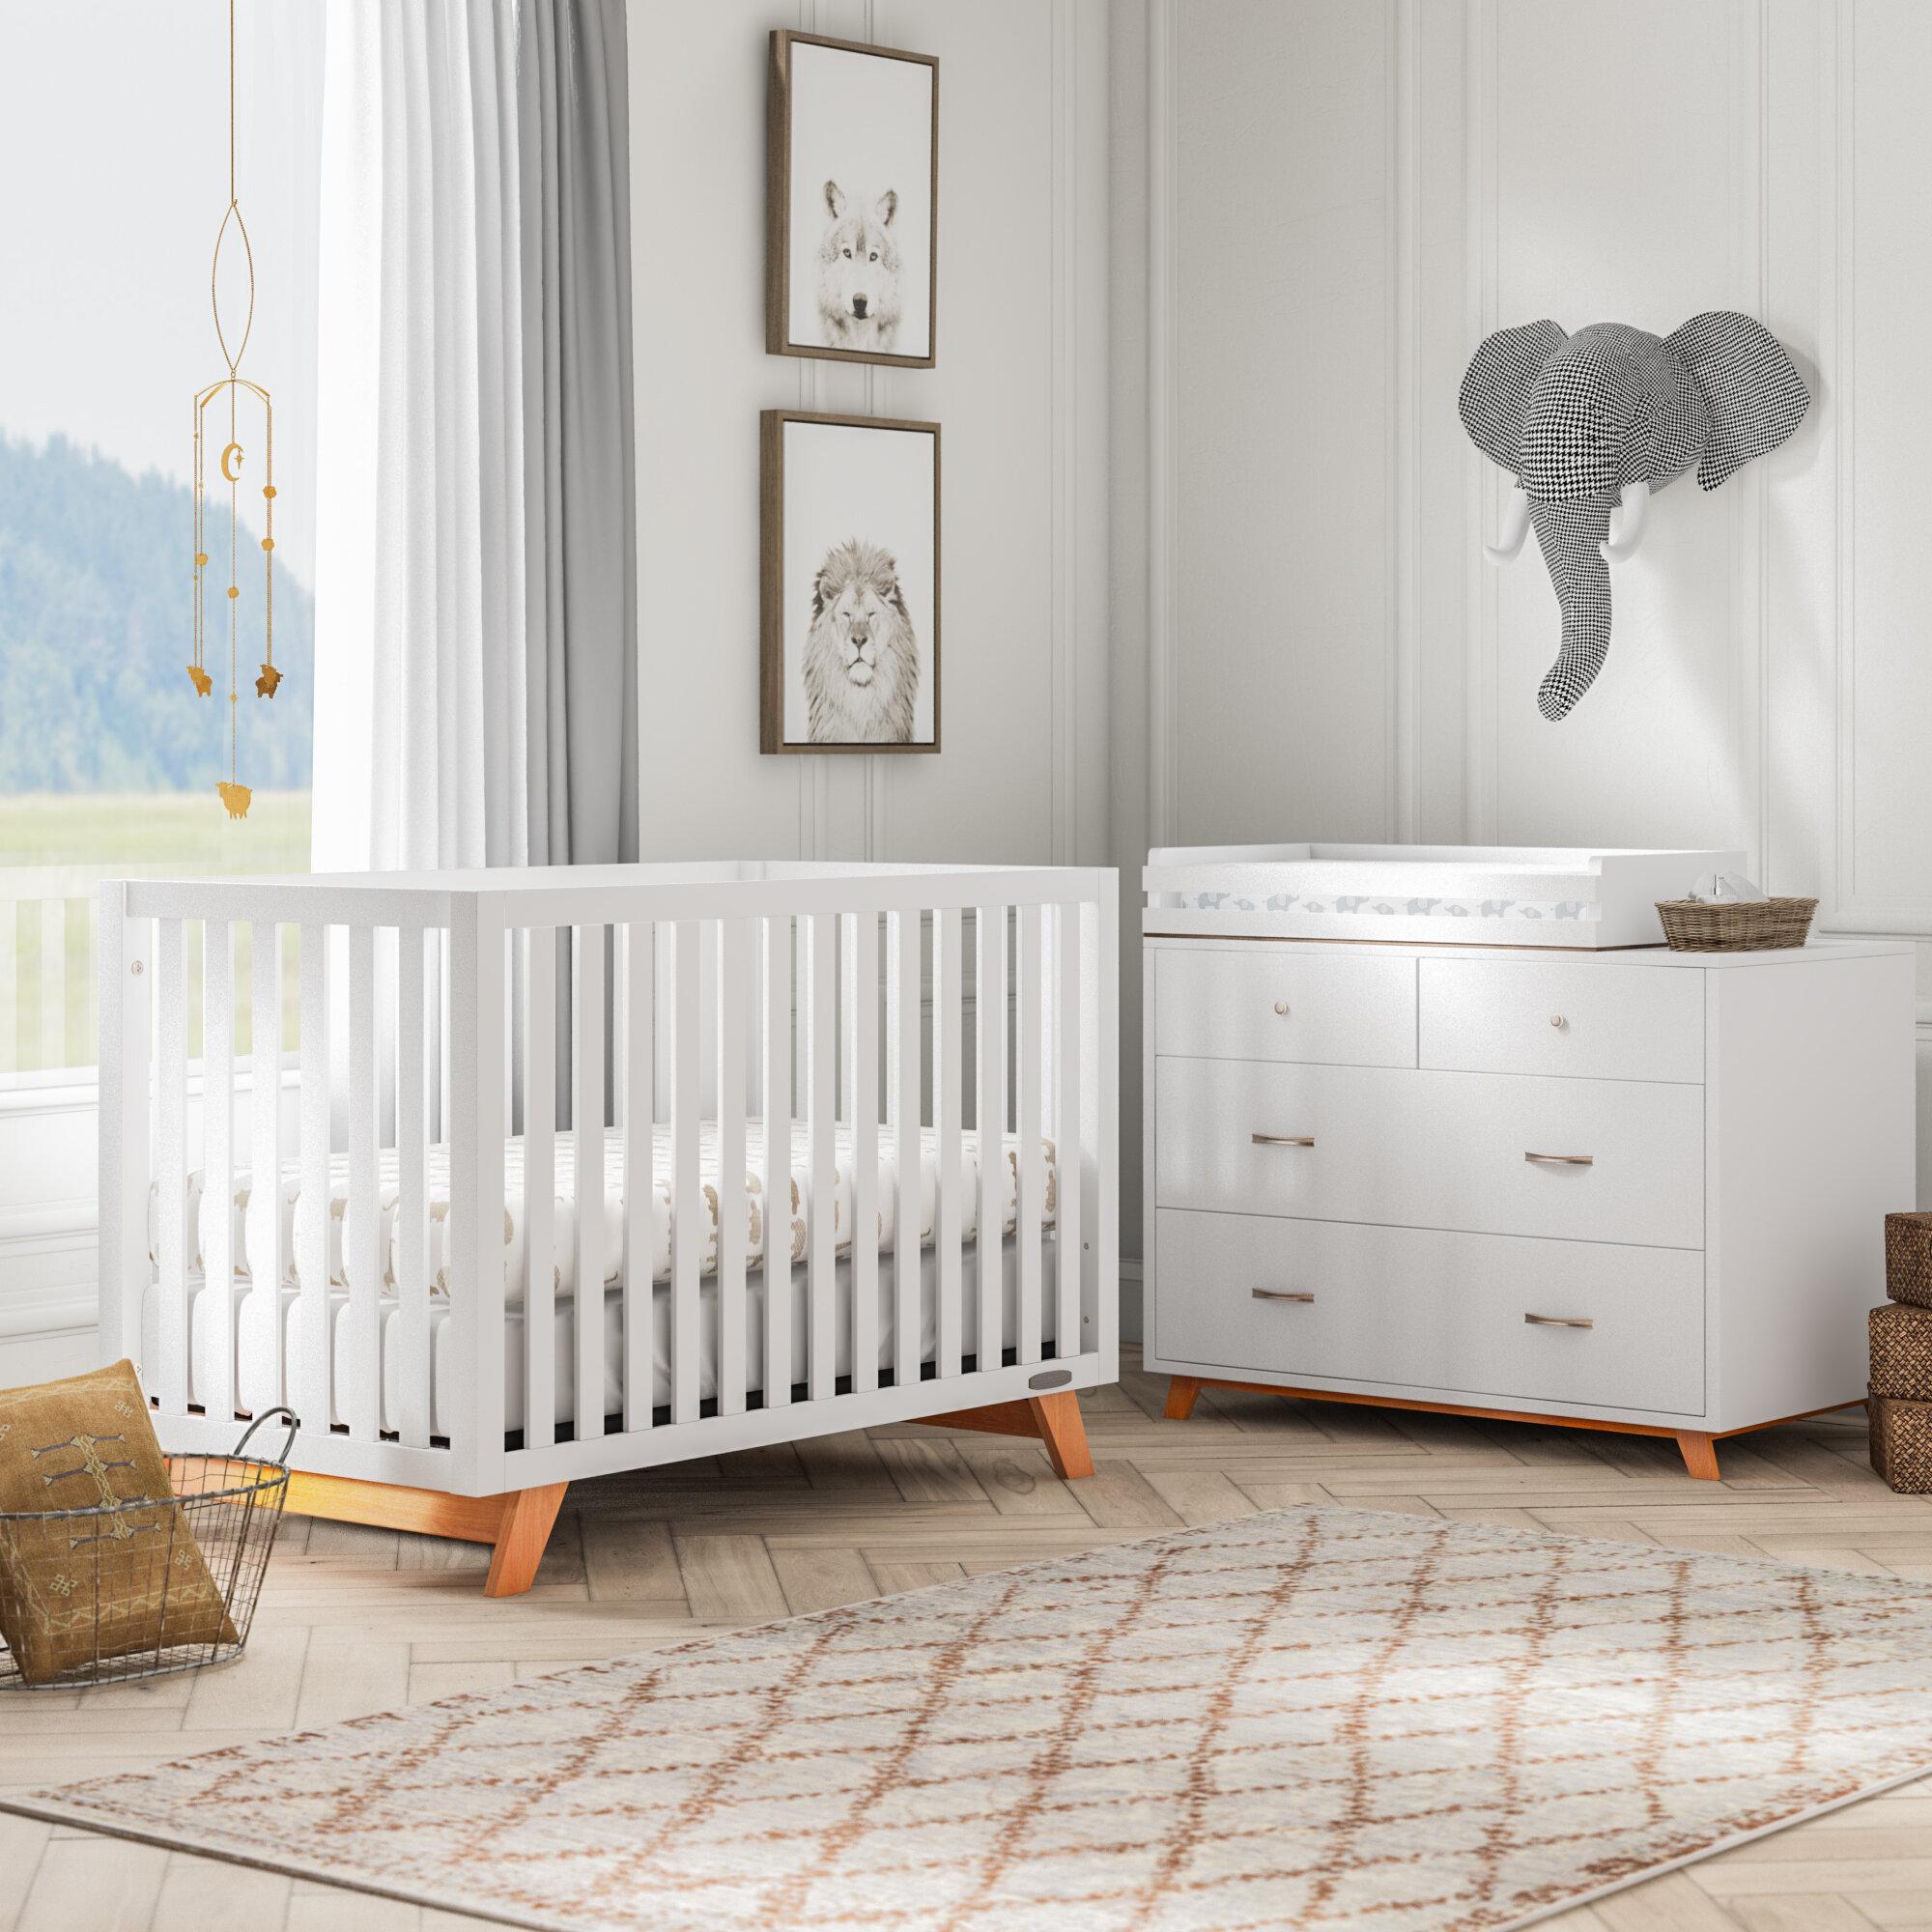 Kaiser Point 4 In 1 Convertible 2 Piece Nursery Furniture Set